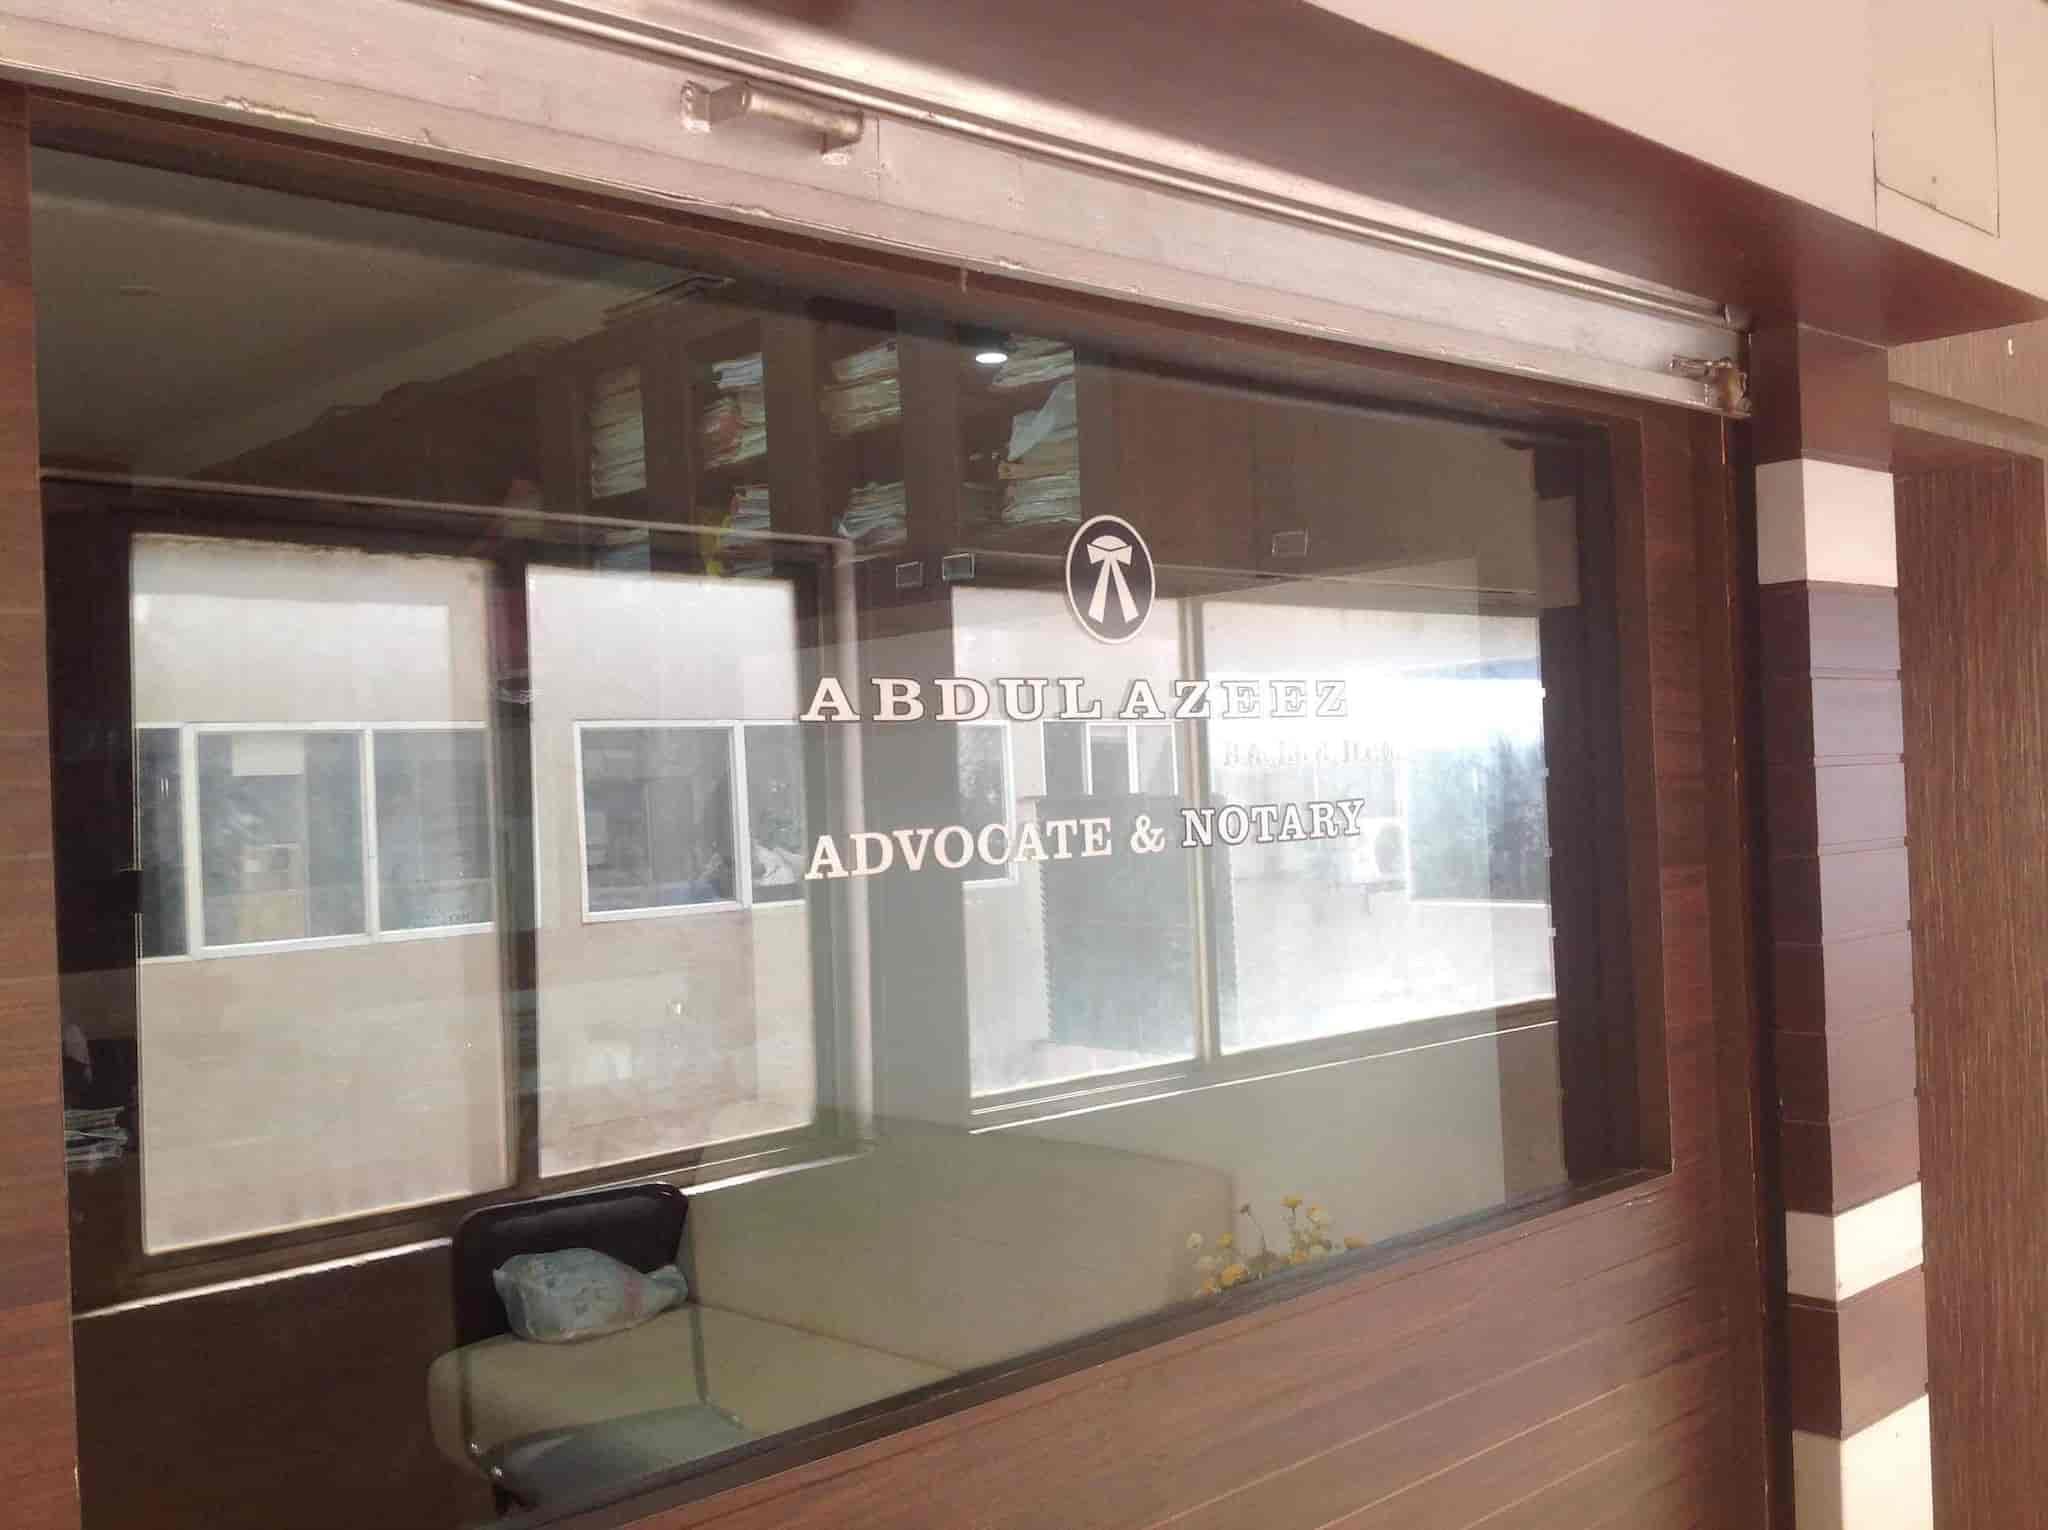 ... Advocate Abdul Azeez Photos Karangalpady MANGALORE - Lawyers ... & Advocate Abdul Azeez Photos Karangalpady Mangalore- Pictures ...